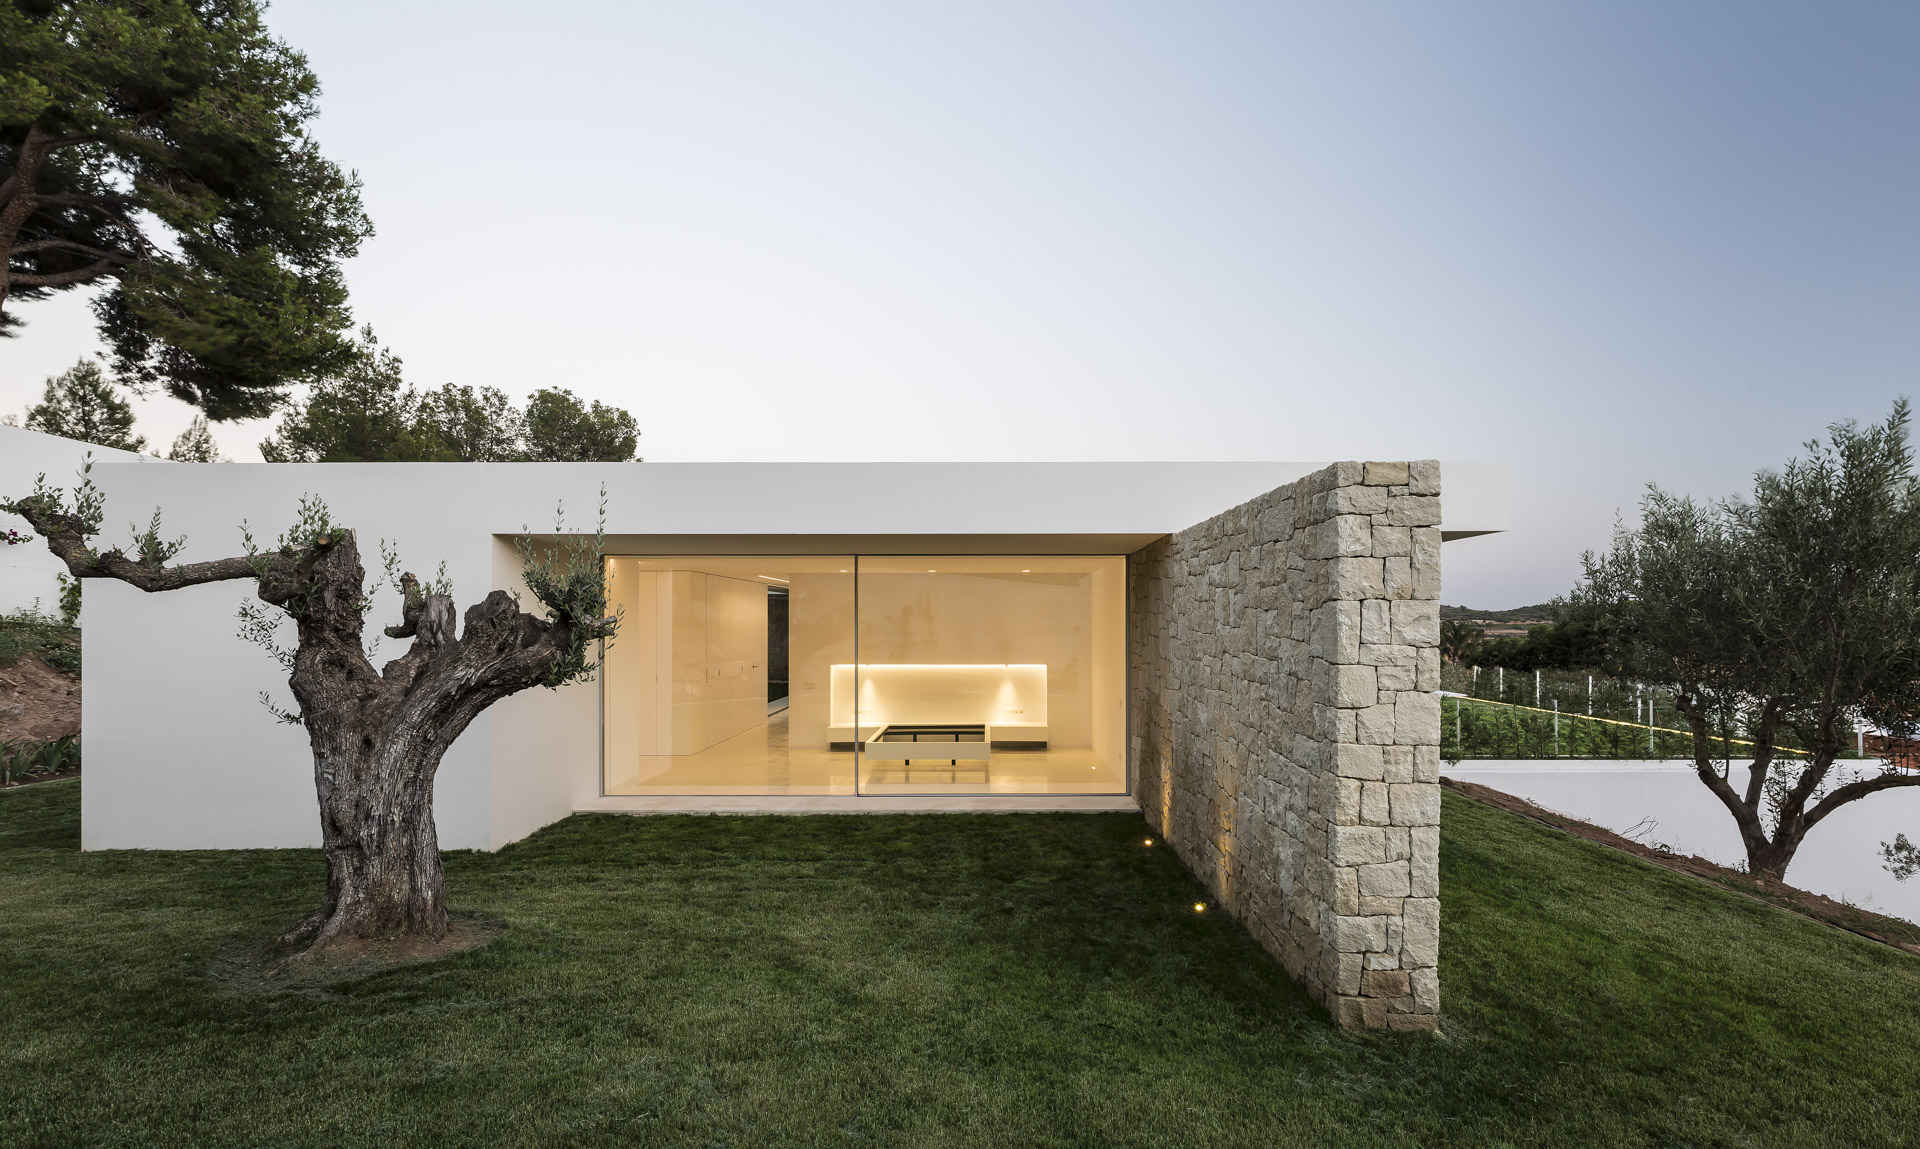 fotografia-arquitectura-valencia-german-cabo-gallardo-llopis-villamarchante-vivienda-58